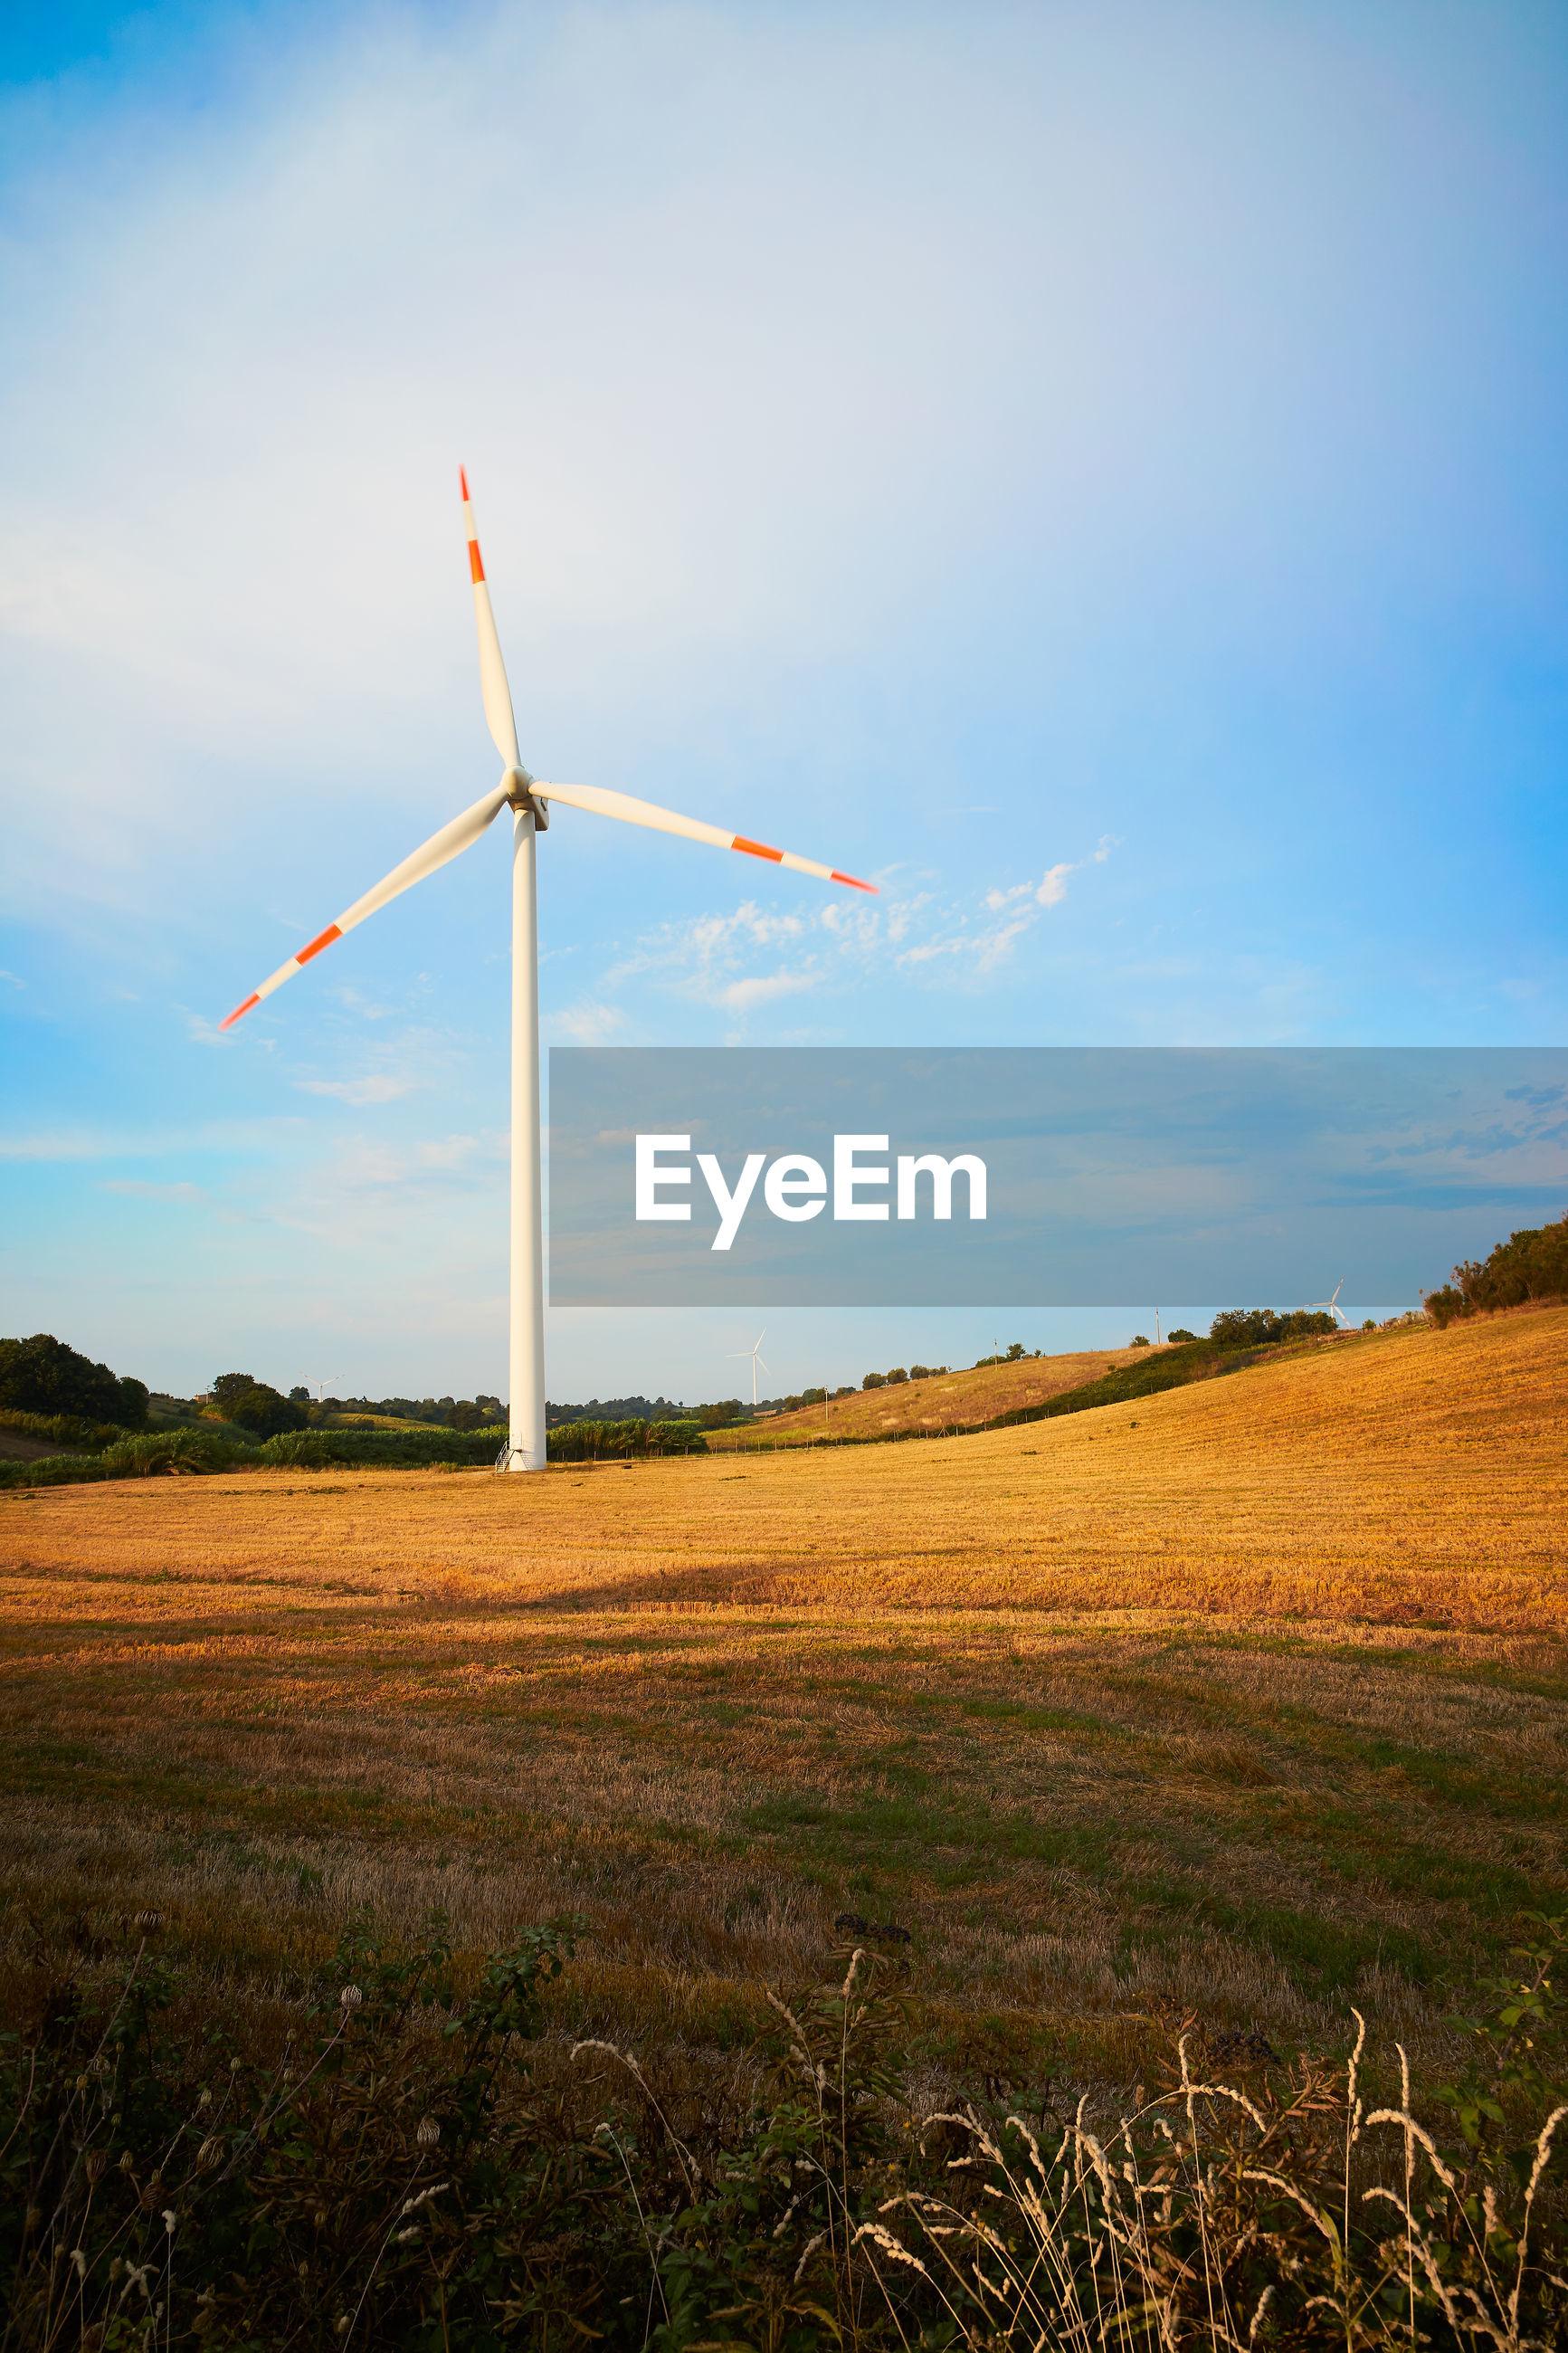 A wind turbine in field between hills in italy